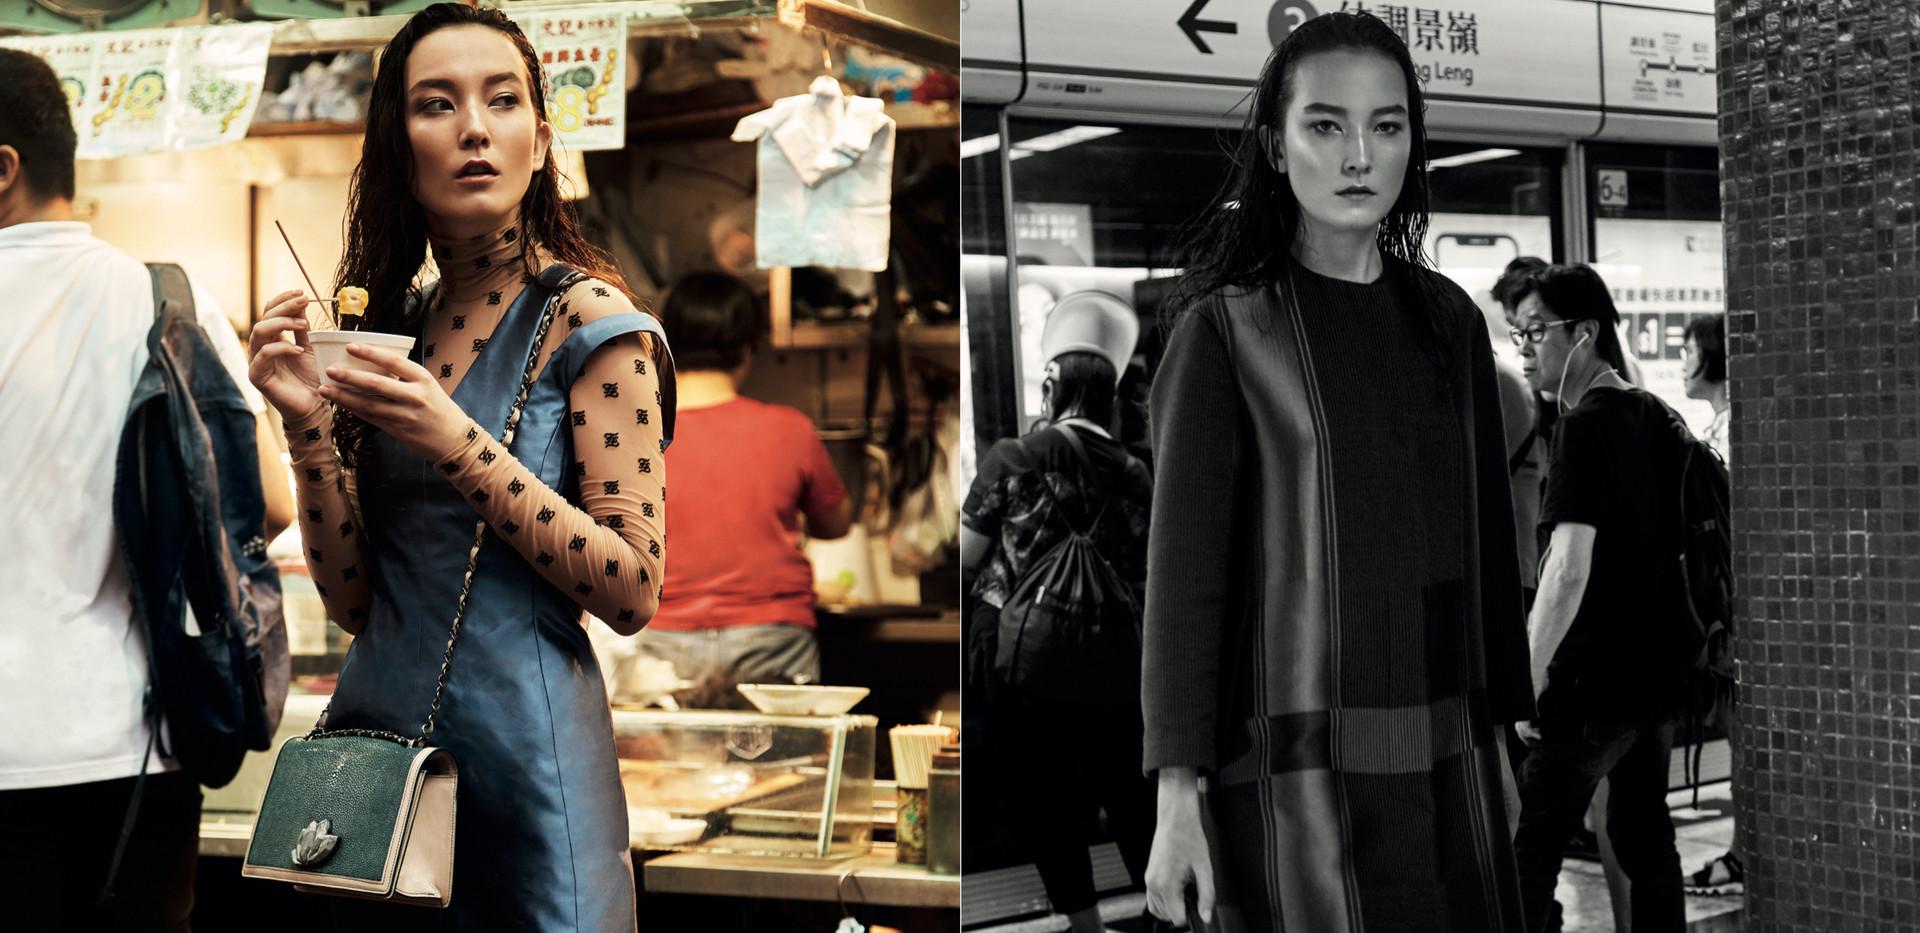 ФОТОГРАФ: MICHELE ROMA   СТИЛИСТ: SILVIA STEFANINI  MODEL: ALENA N @SUNSEE MODEL HONG KONG   MAKE UP AND HAIR: KAMMY AMA LO  STYLIST ASSISTANT: ANNA GAGLIANO   PHOTOGRAPHER'S ASSISTANT: EDWIN SHIZUKU